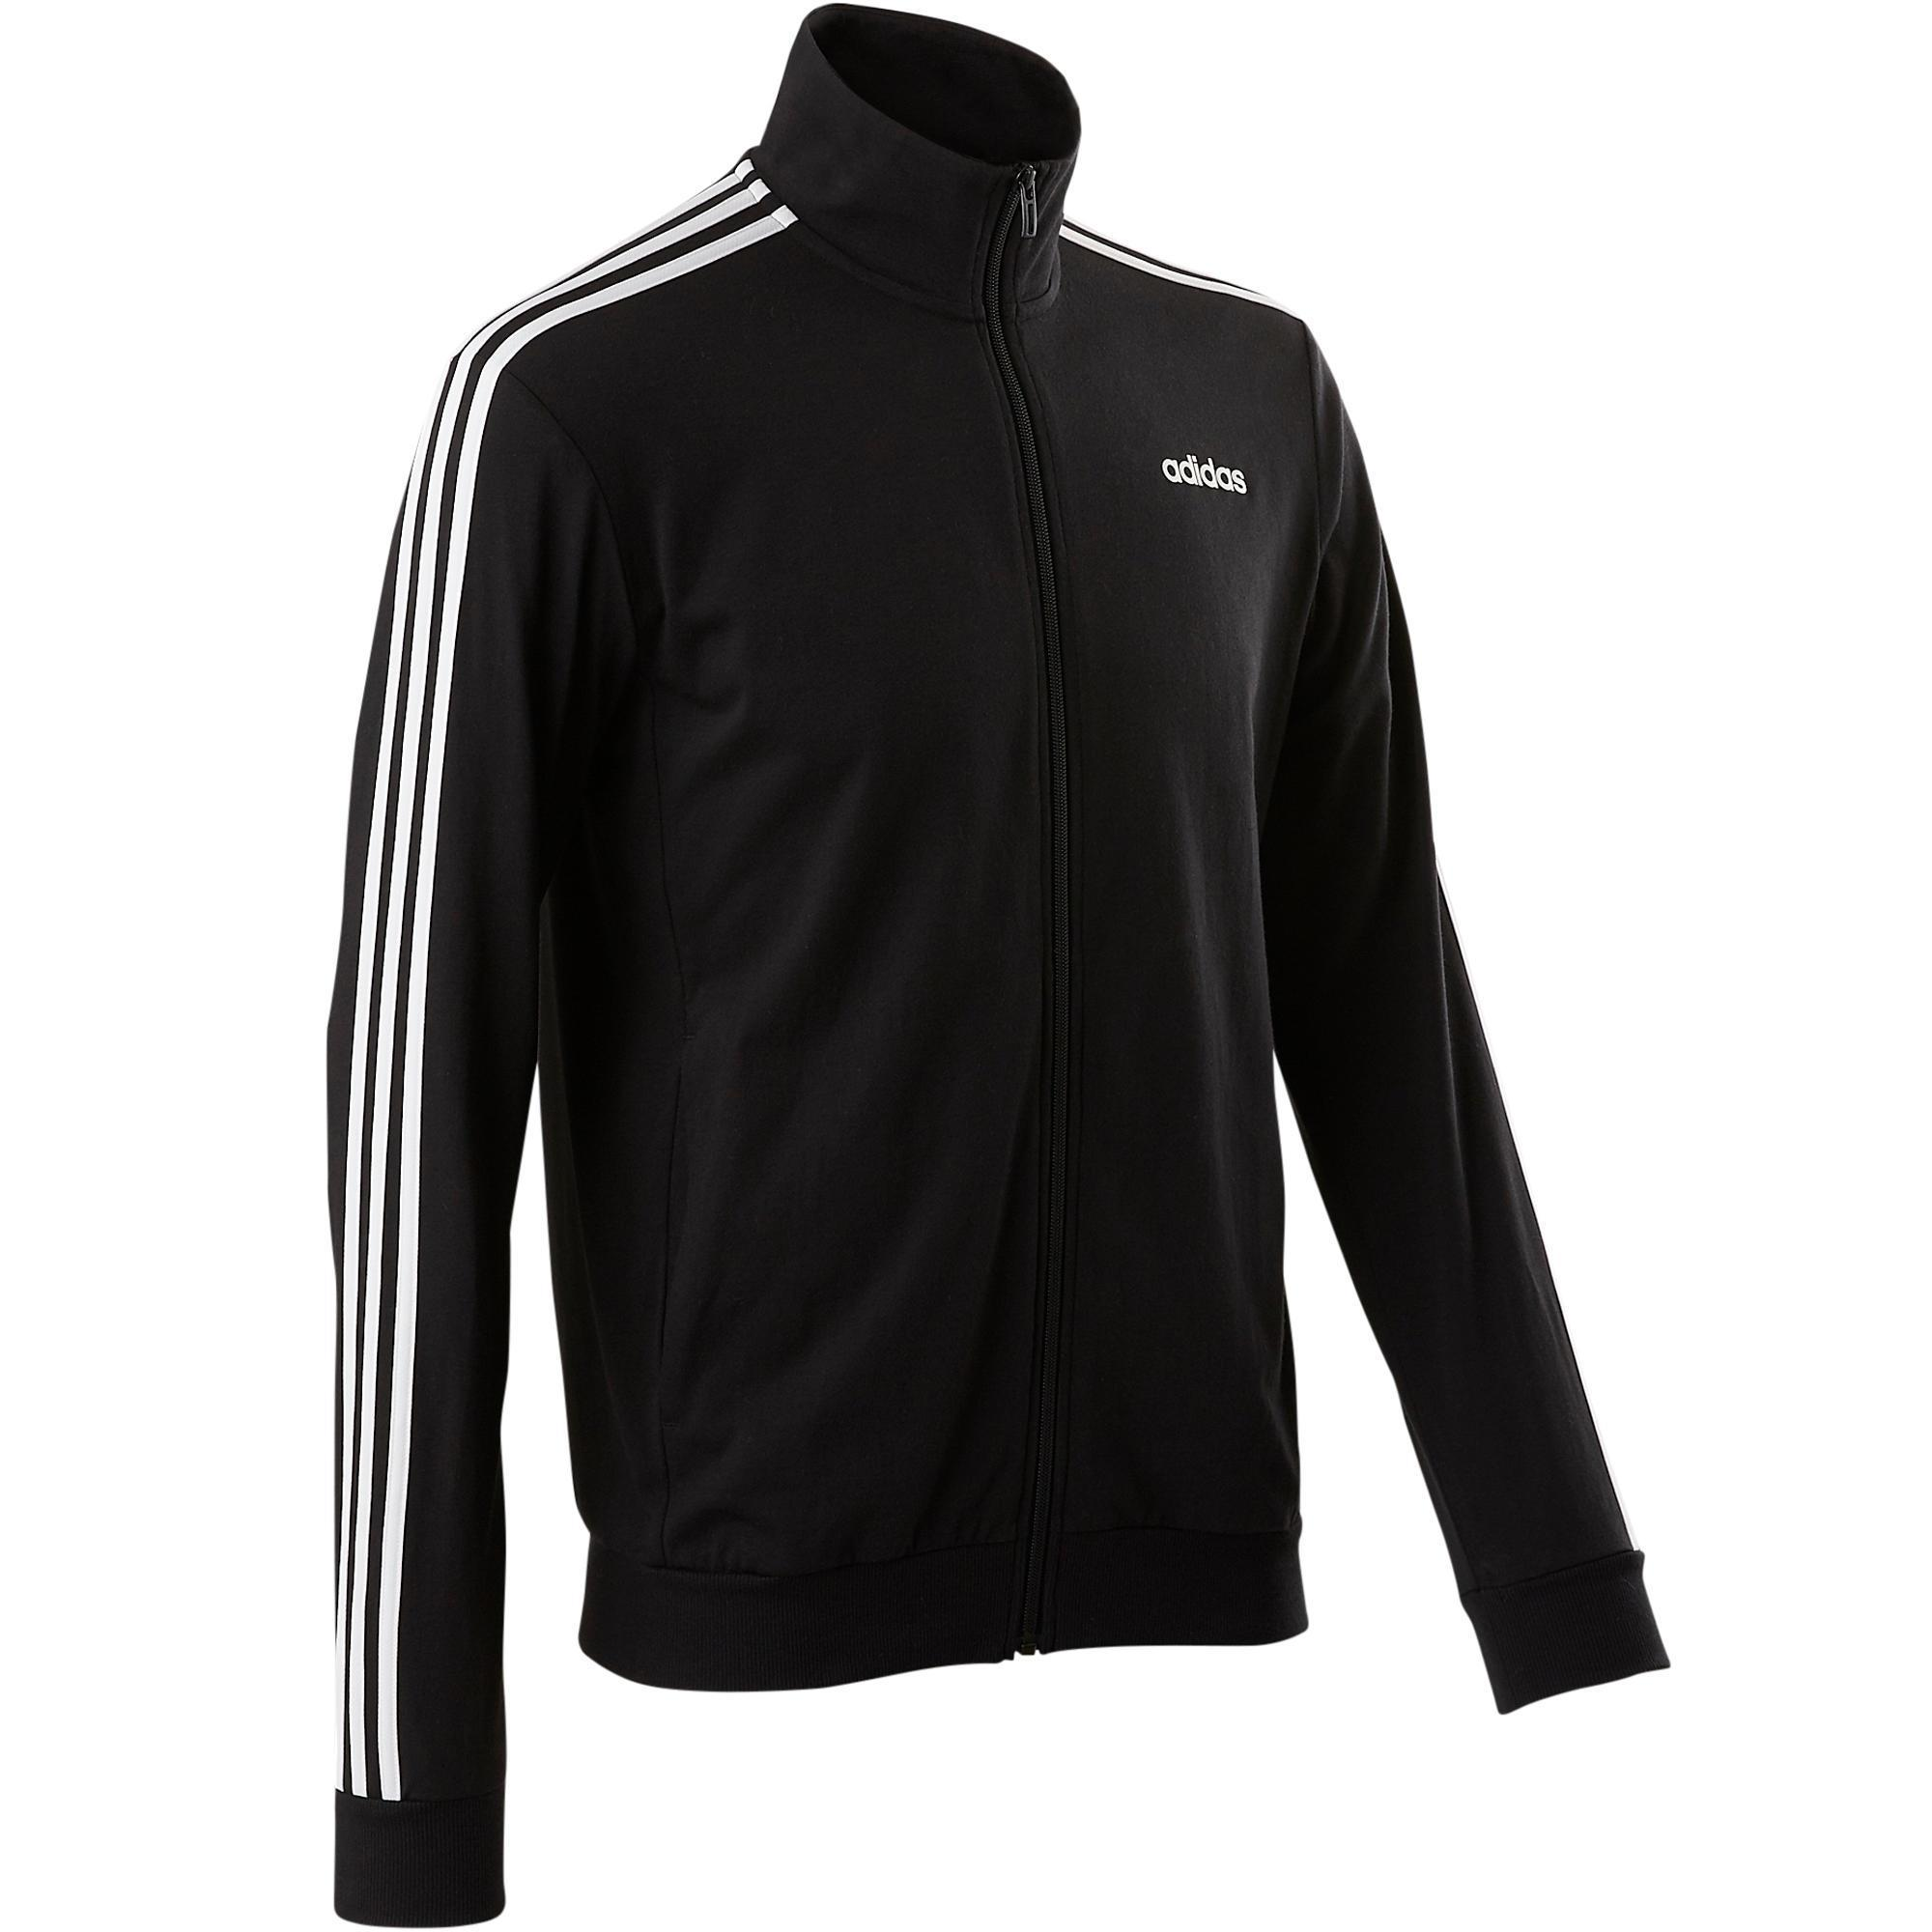 finest selection 76907 5518d Adidas   Ropa   Zapatillas   en Decathlon